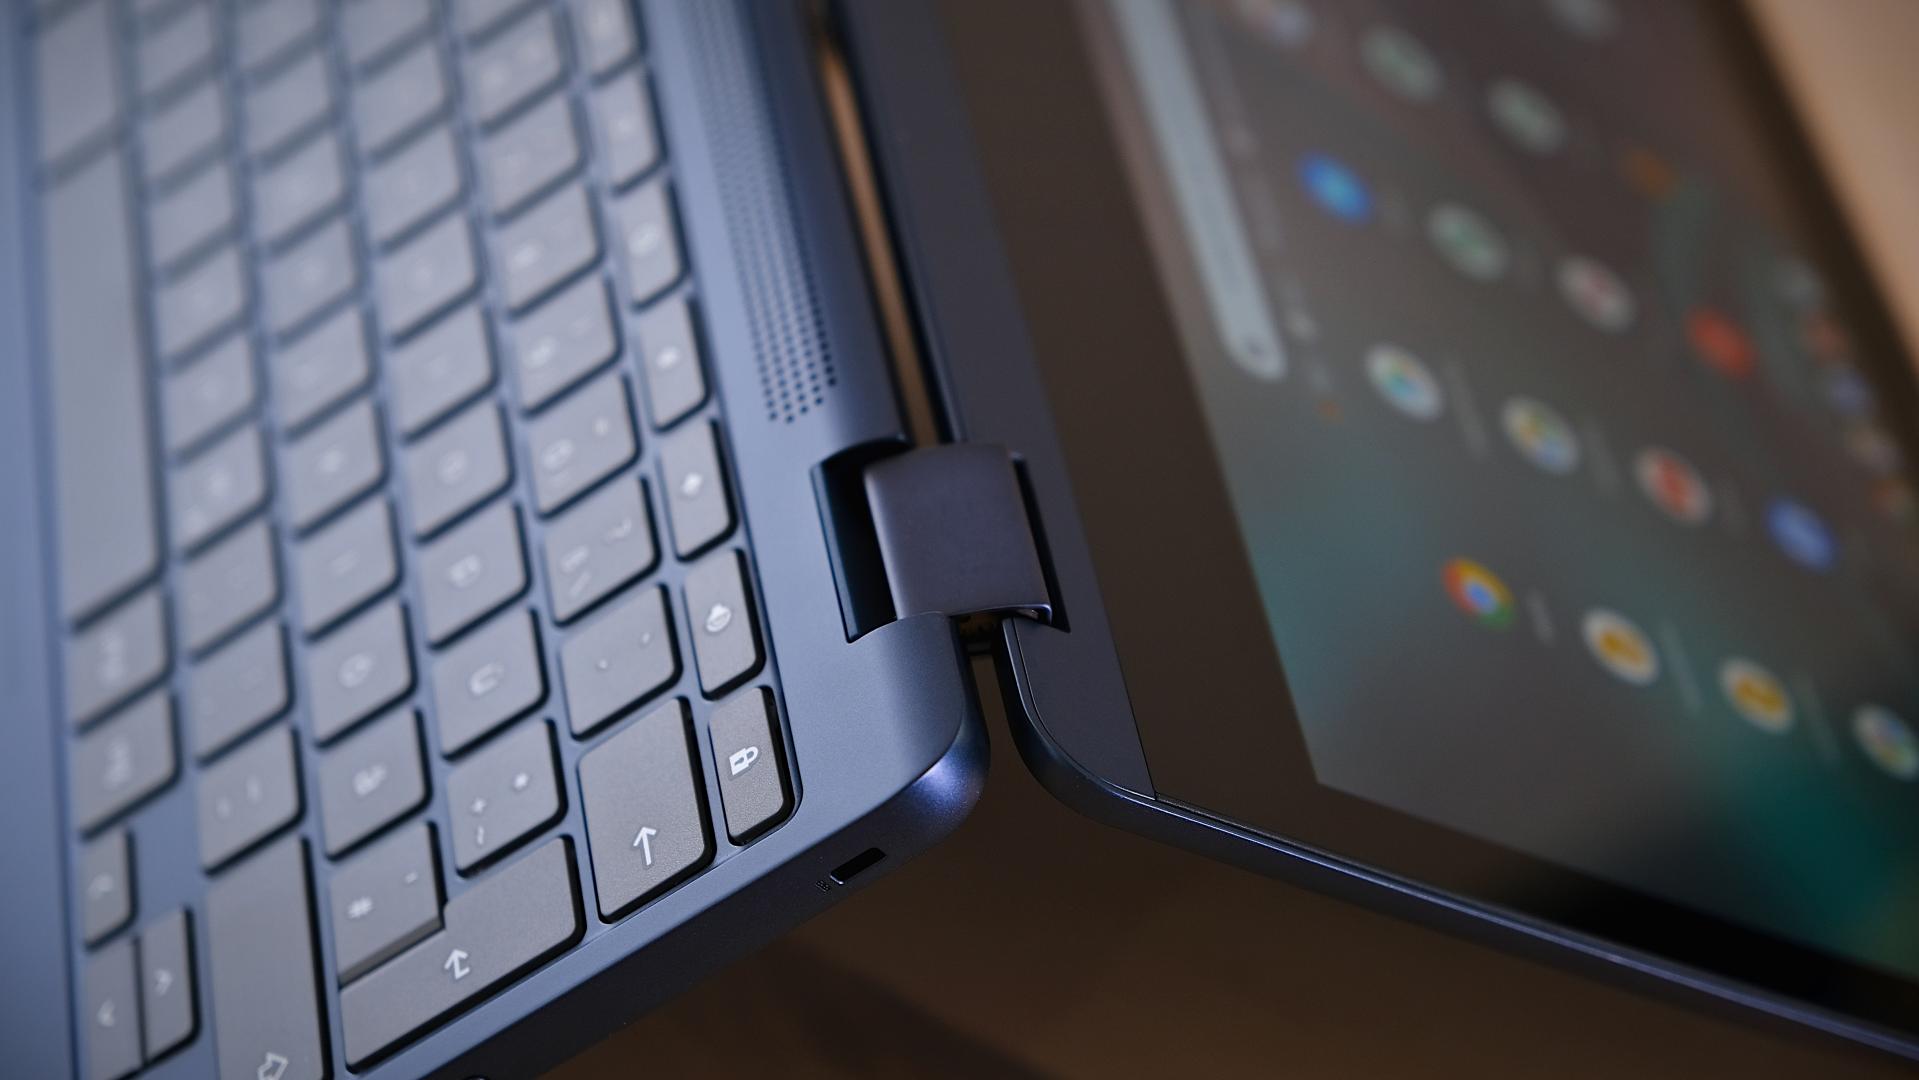 Lenovo IdeaPad Flex 3 Chromebook Review